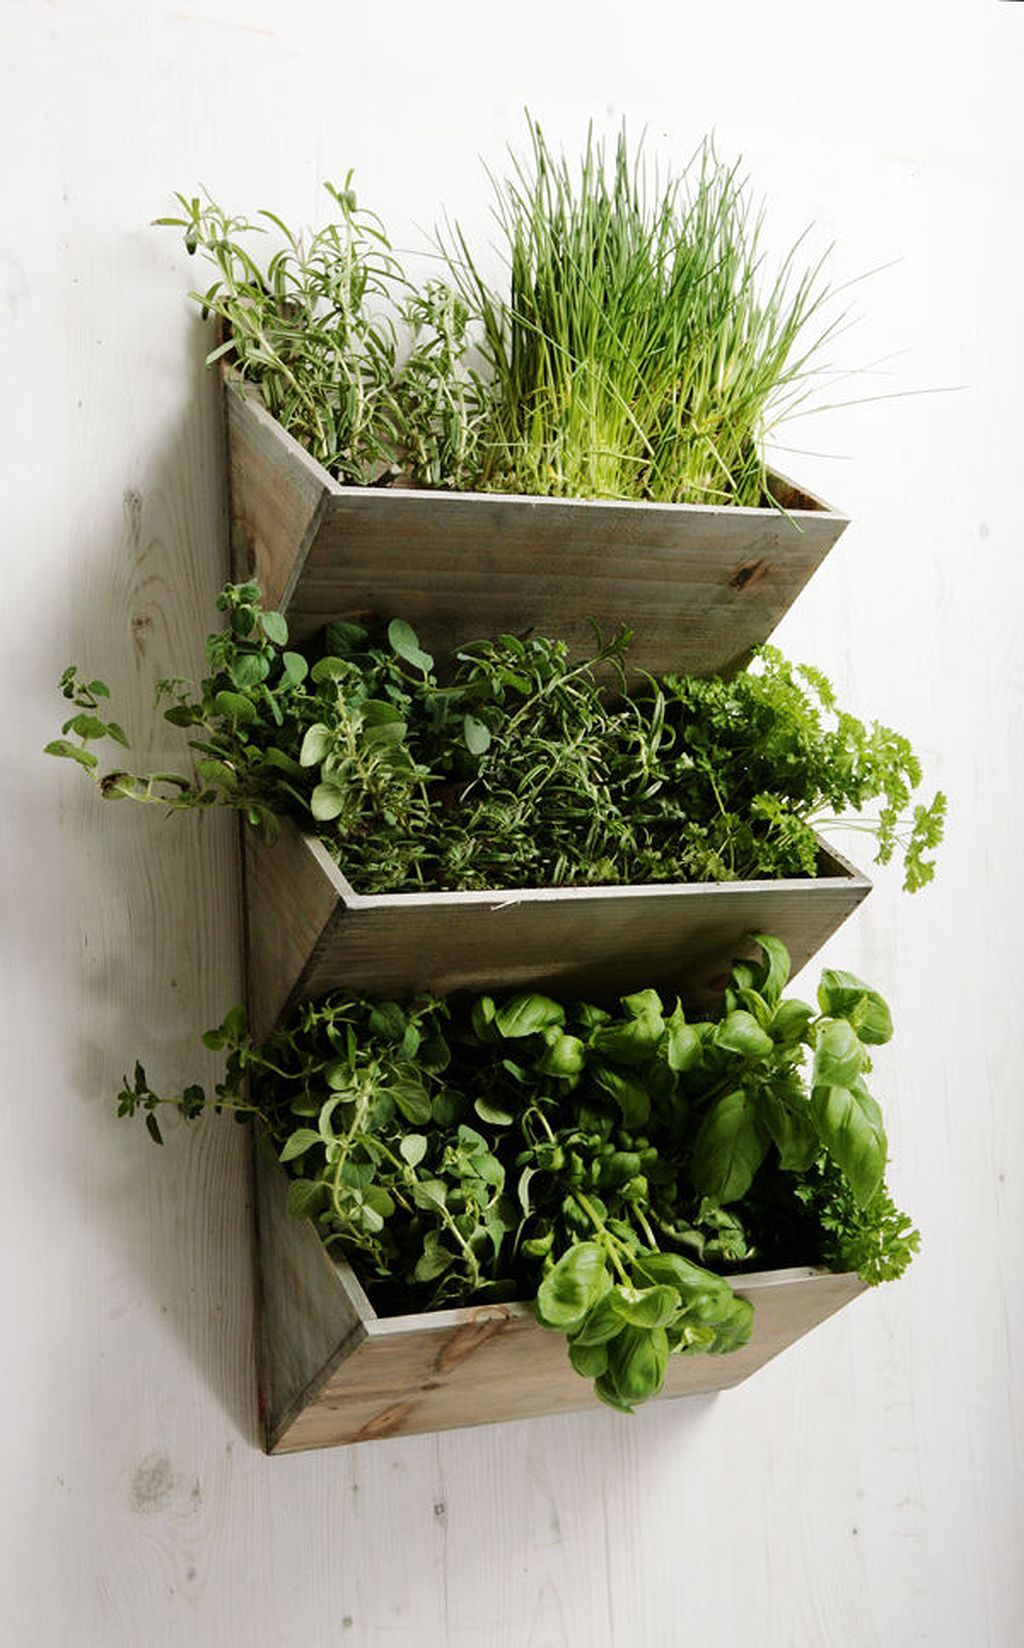 24 diy outdoor planters for herbs and vegetables on indoor herb garden diy wall vertical planter id=67589